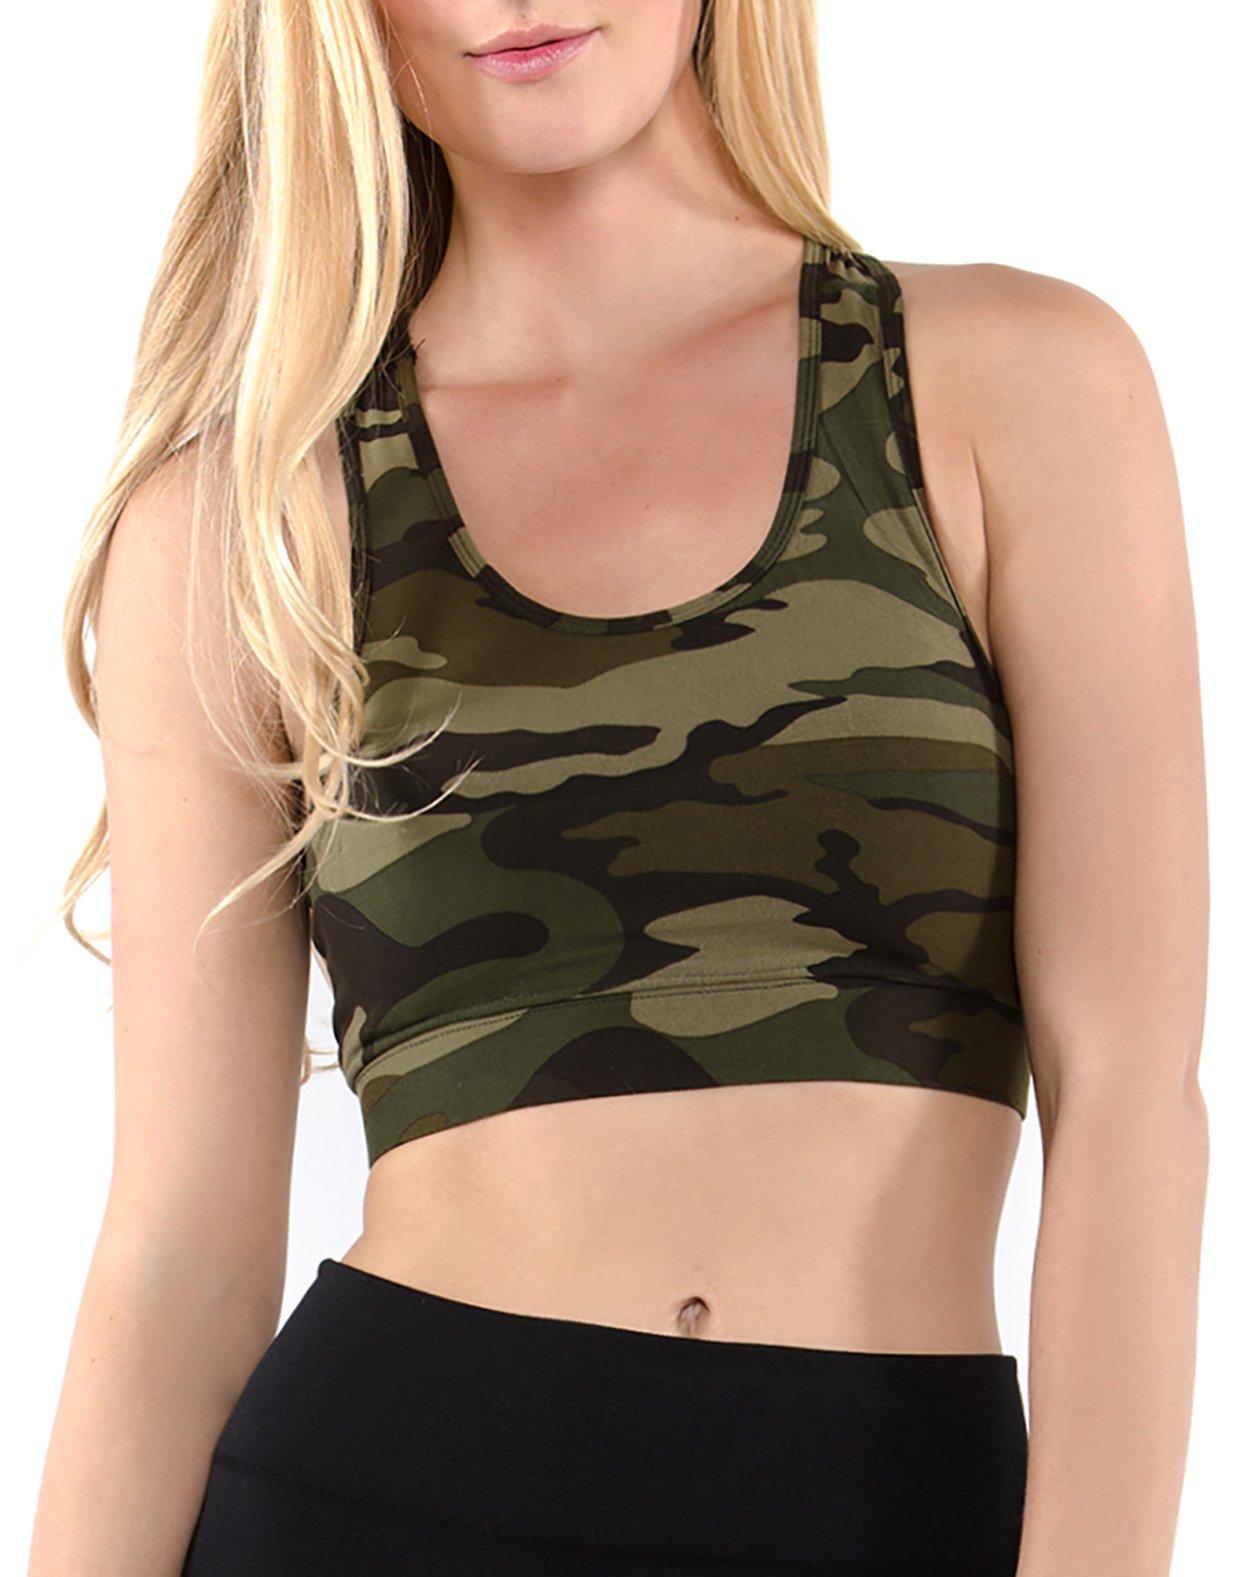 Vibrant Vixen Women's Yoga Sports Bra with Removable Pads Camouflage Print Workout Top (VBCM-Green, L/XL)